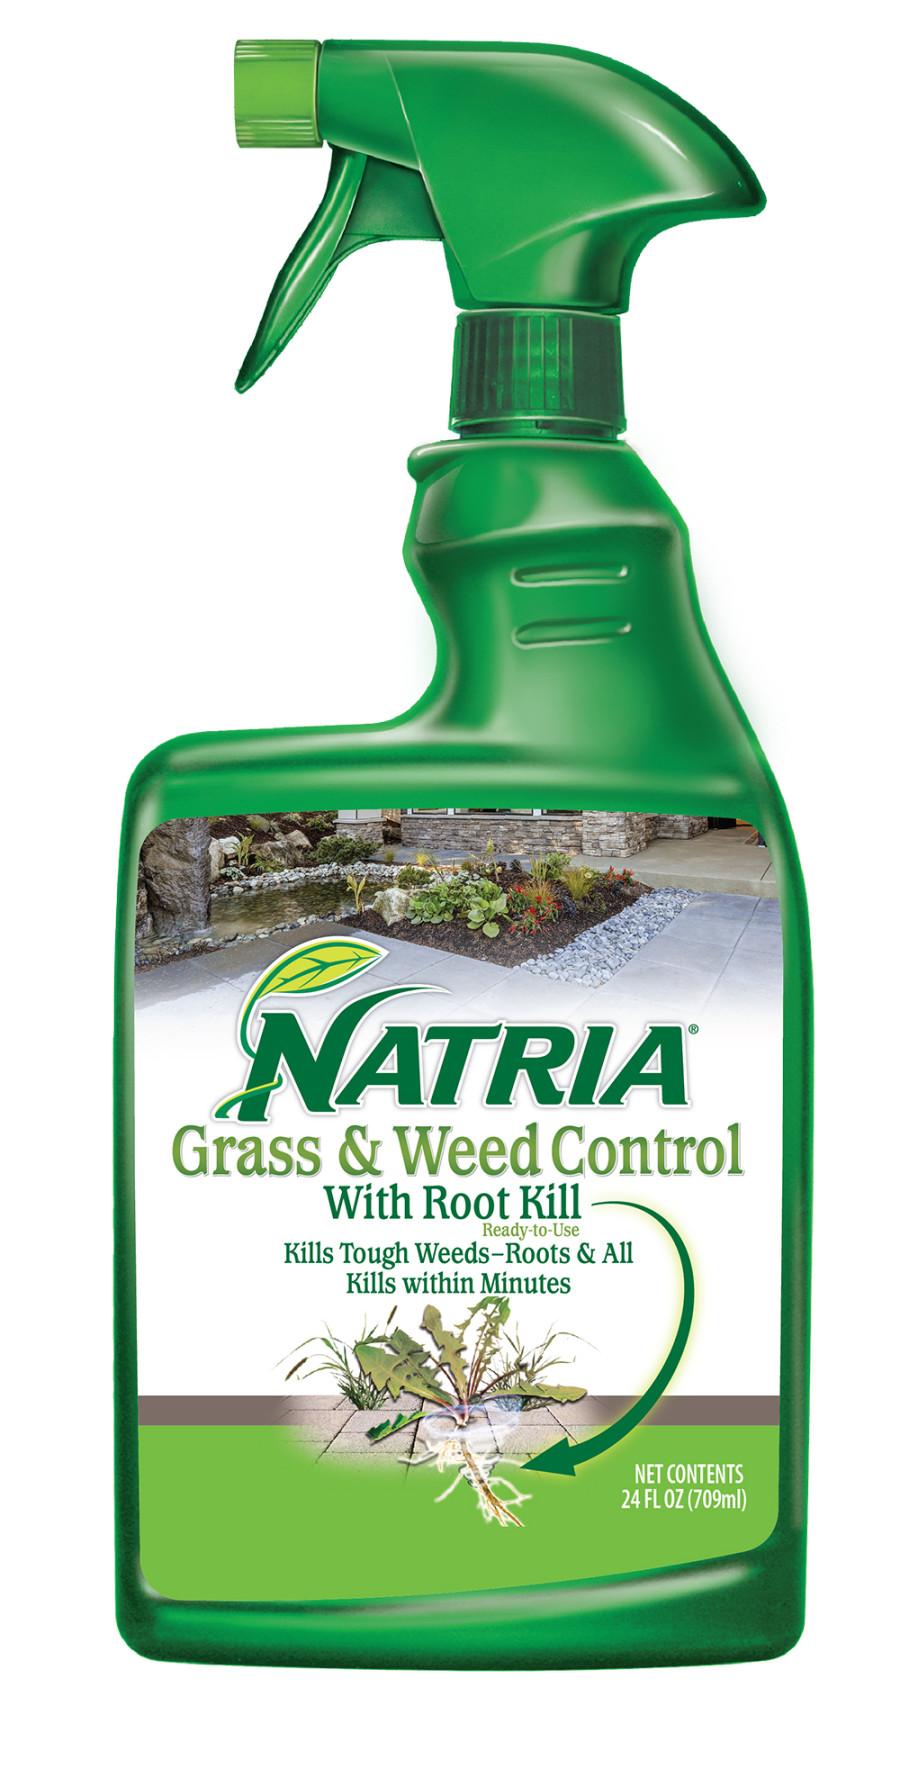 BioAdvanced Natria Grass & Weed Control w/Root Kill Ready to Use Sprayer Green Bottle 4ea/24 oz